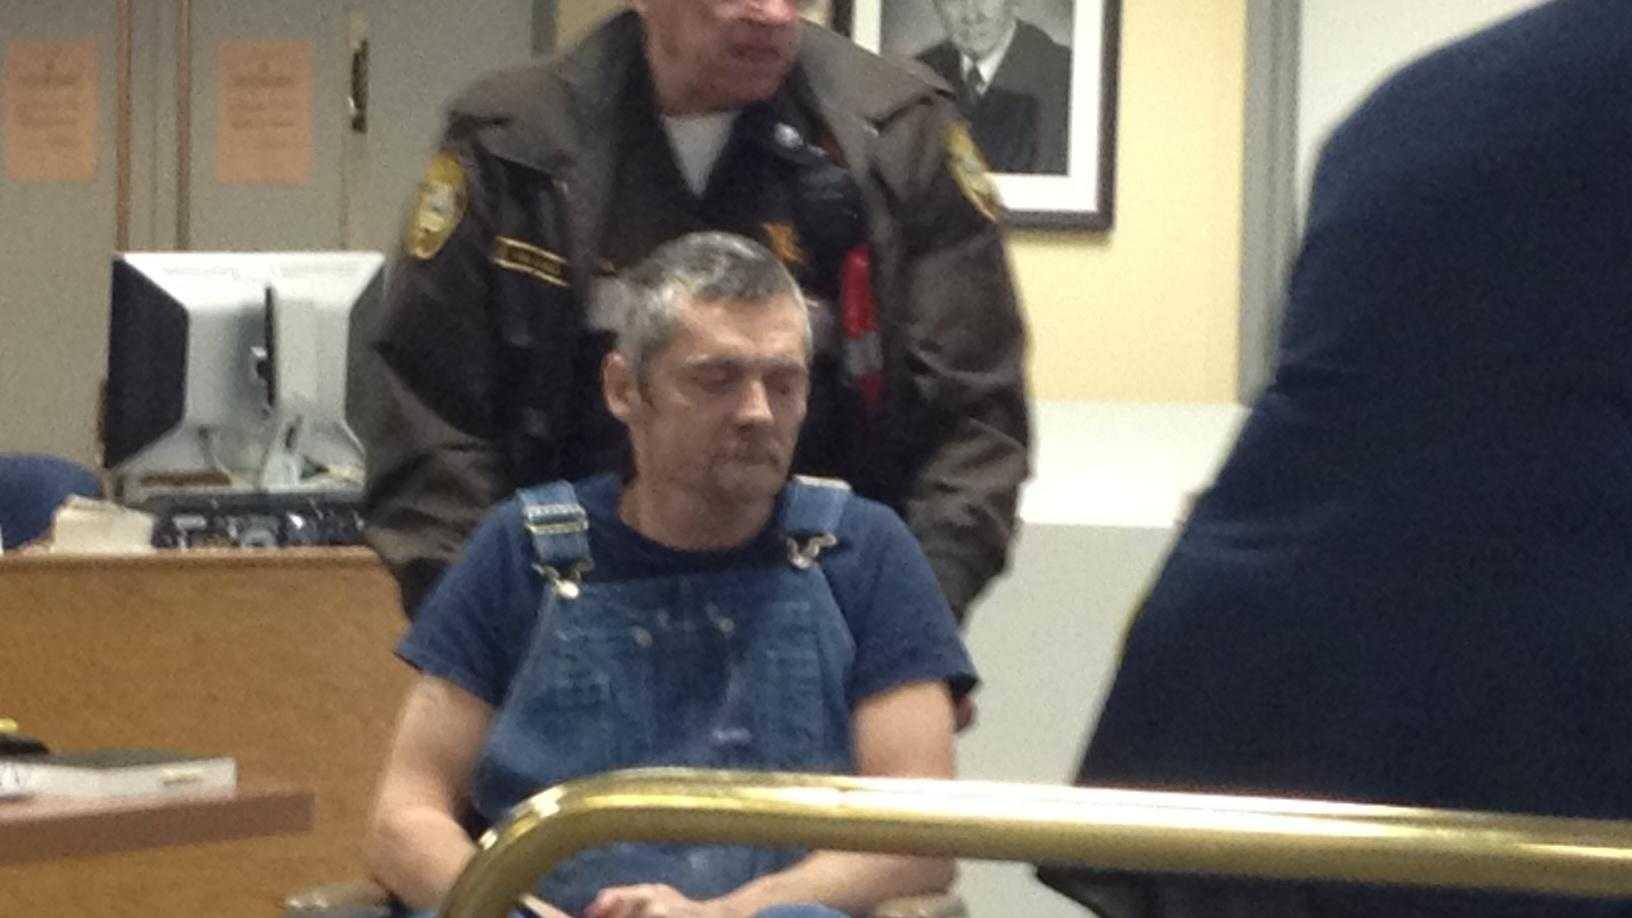 David Carrier in court